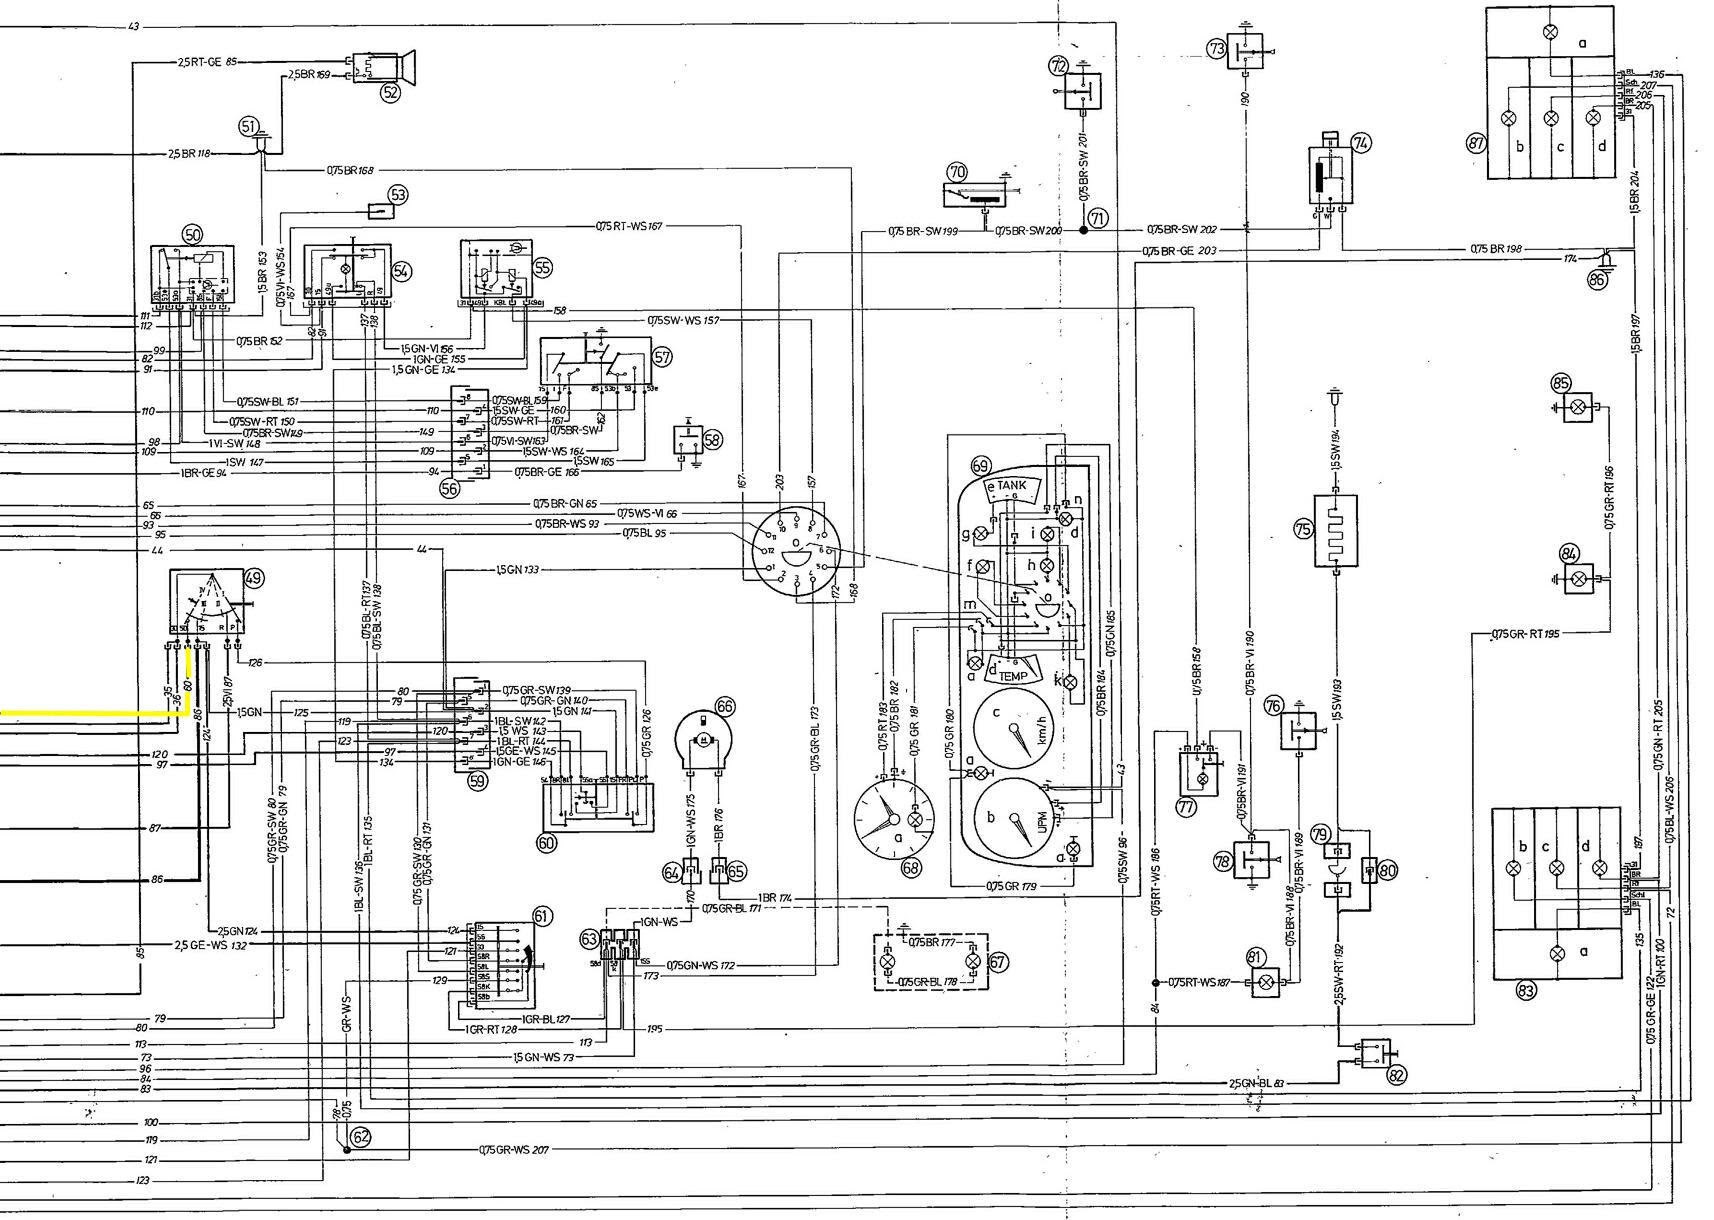 1976 Bmw 2002 Wiring Diagram Schematic Wiring Diagram Component C Component C Consorziofiuggiturismo It